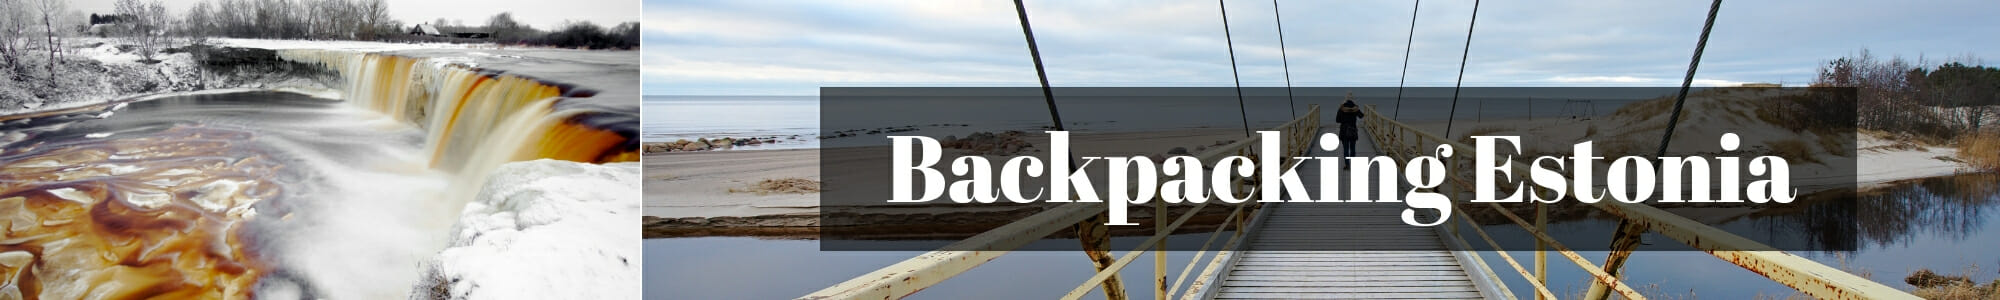 backpacking estonia